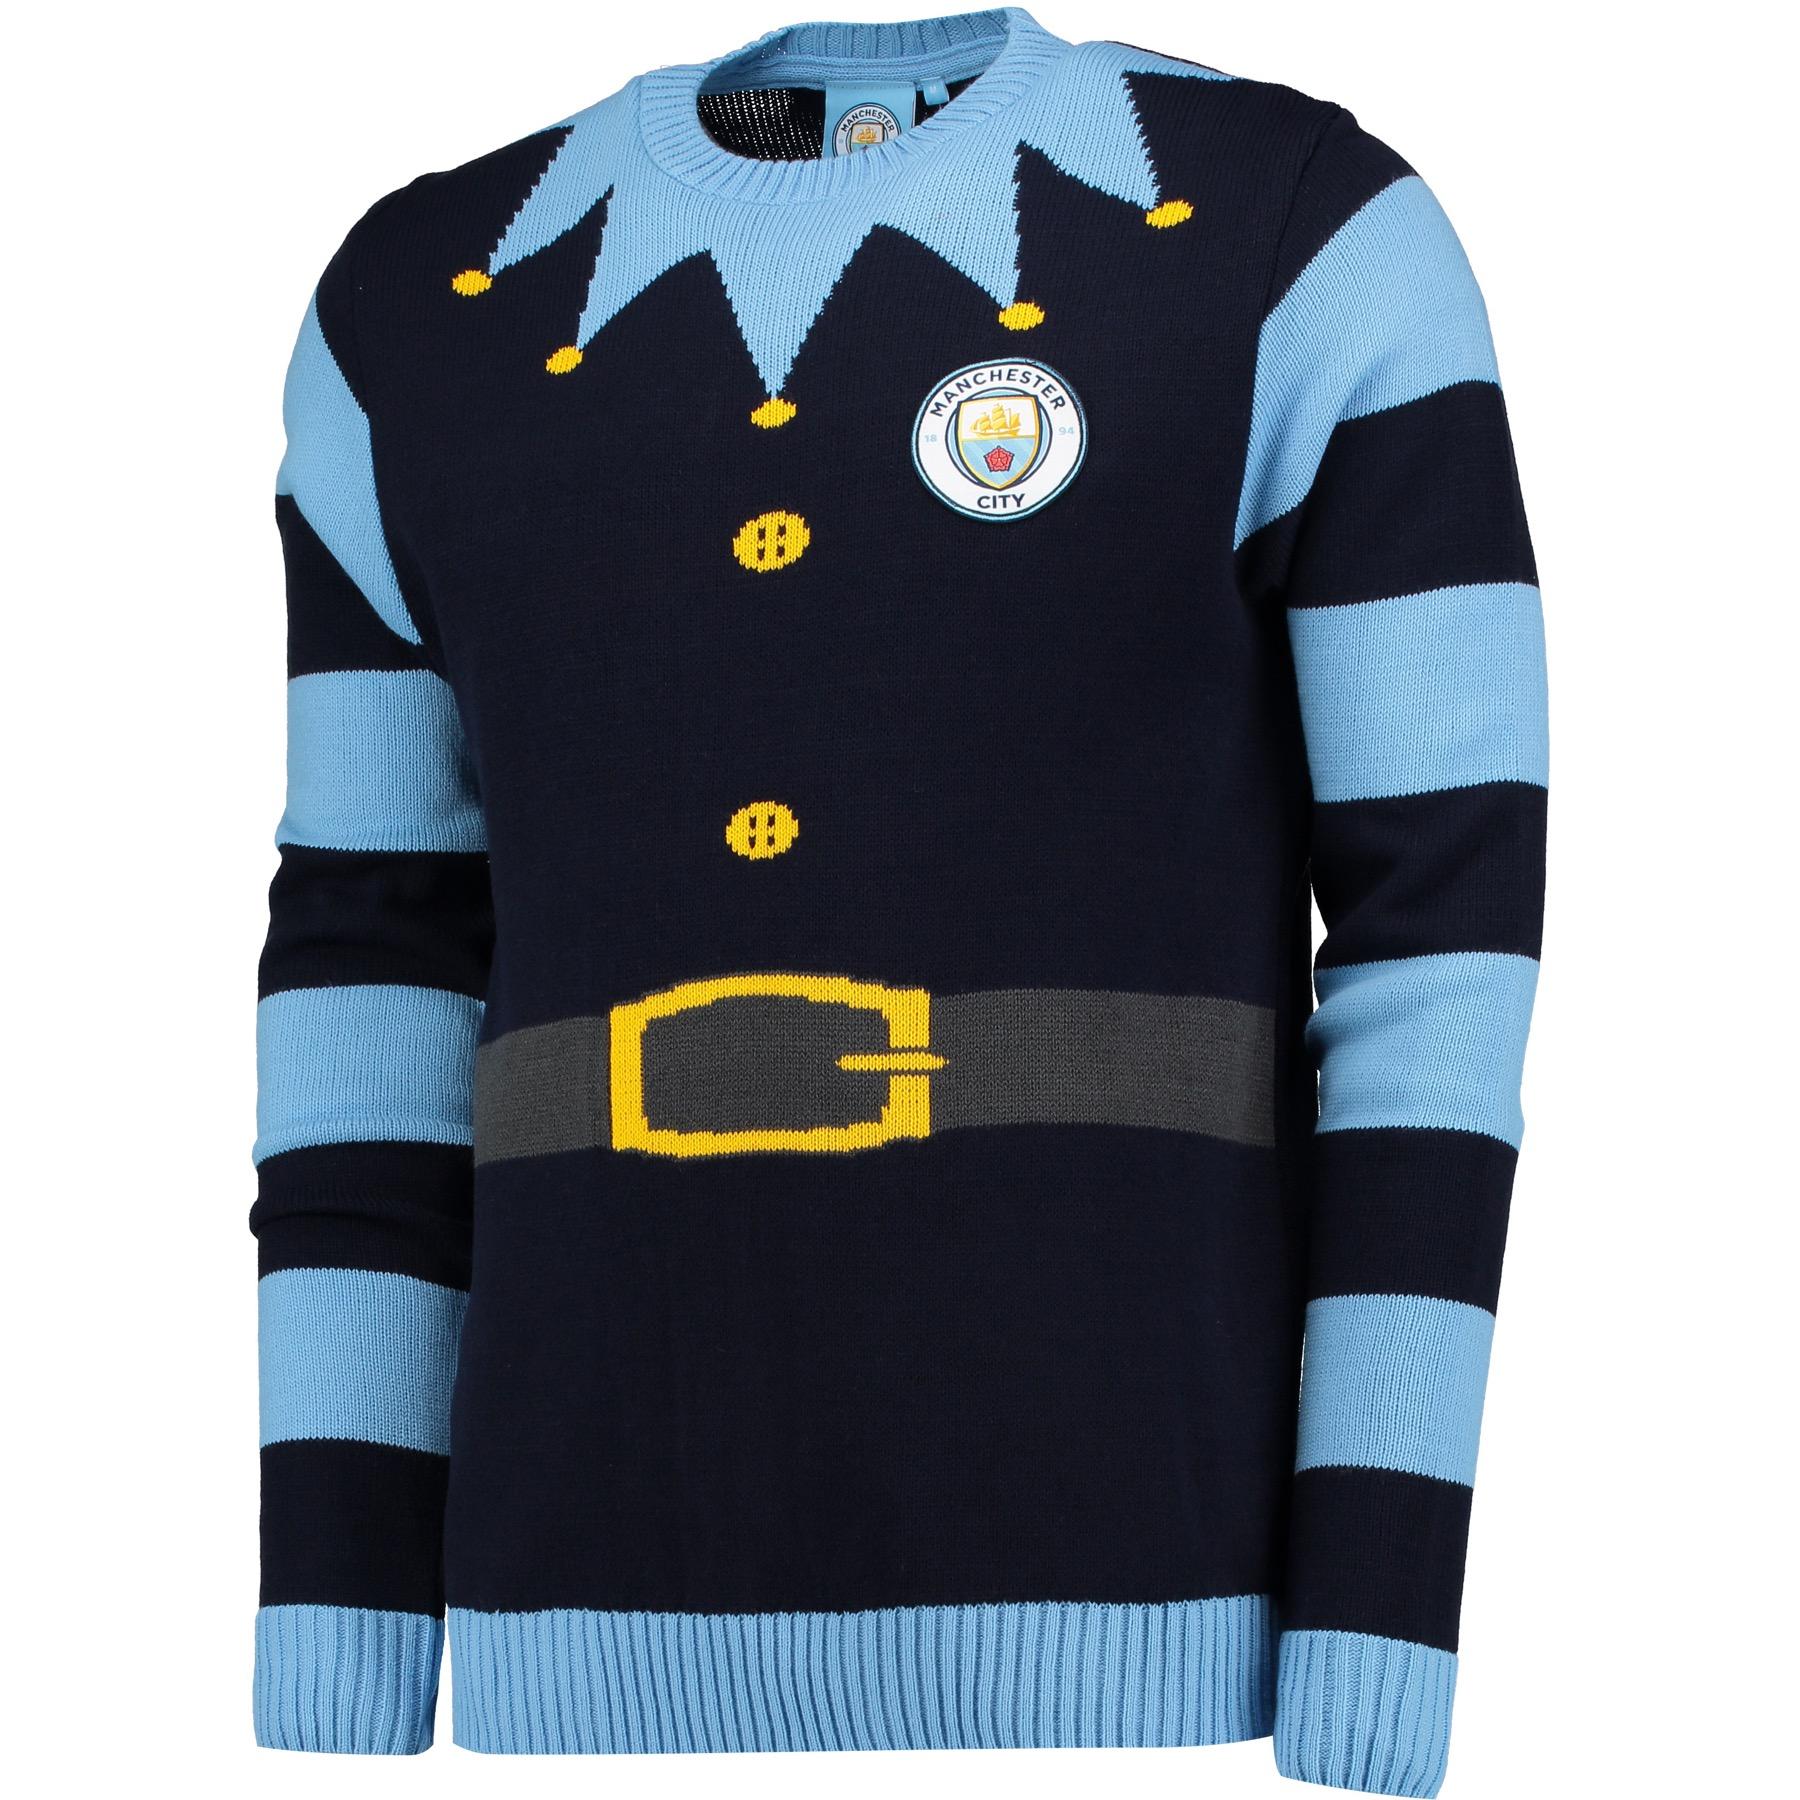 Manchester City Elf Christmas Jumper - Navy